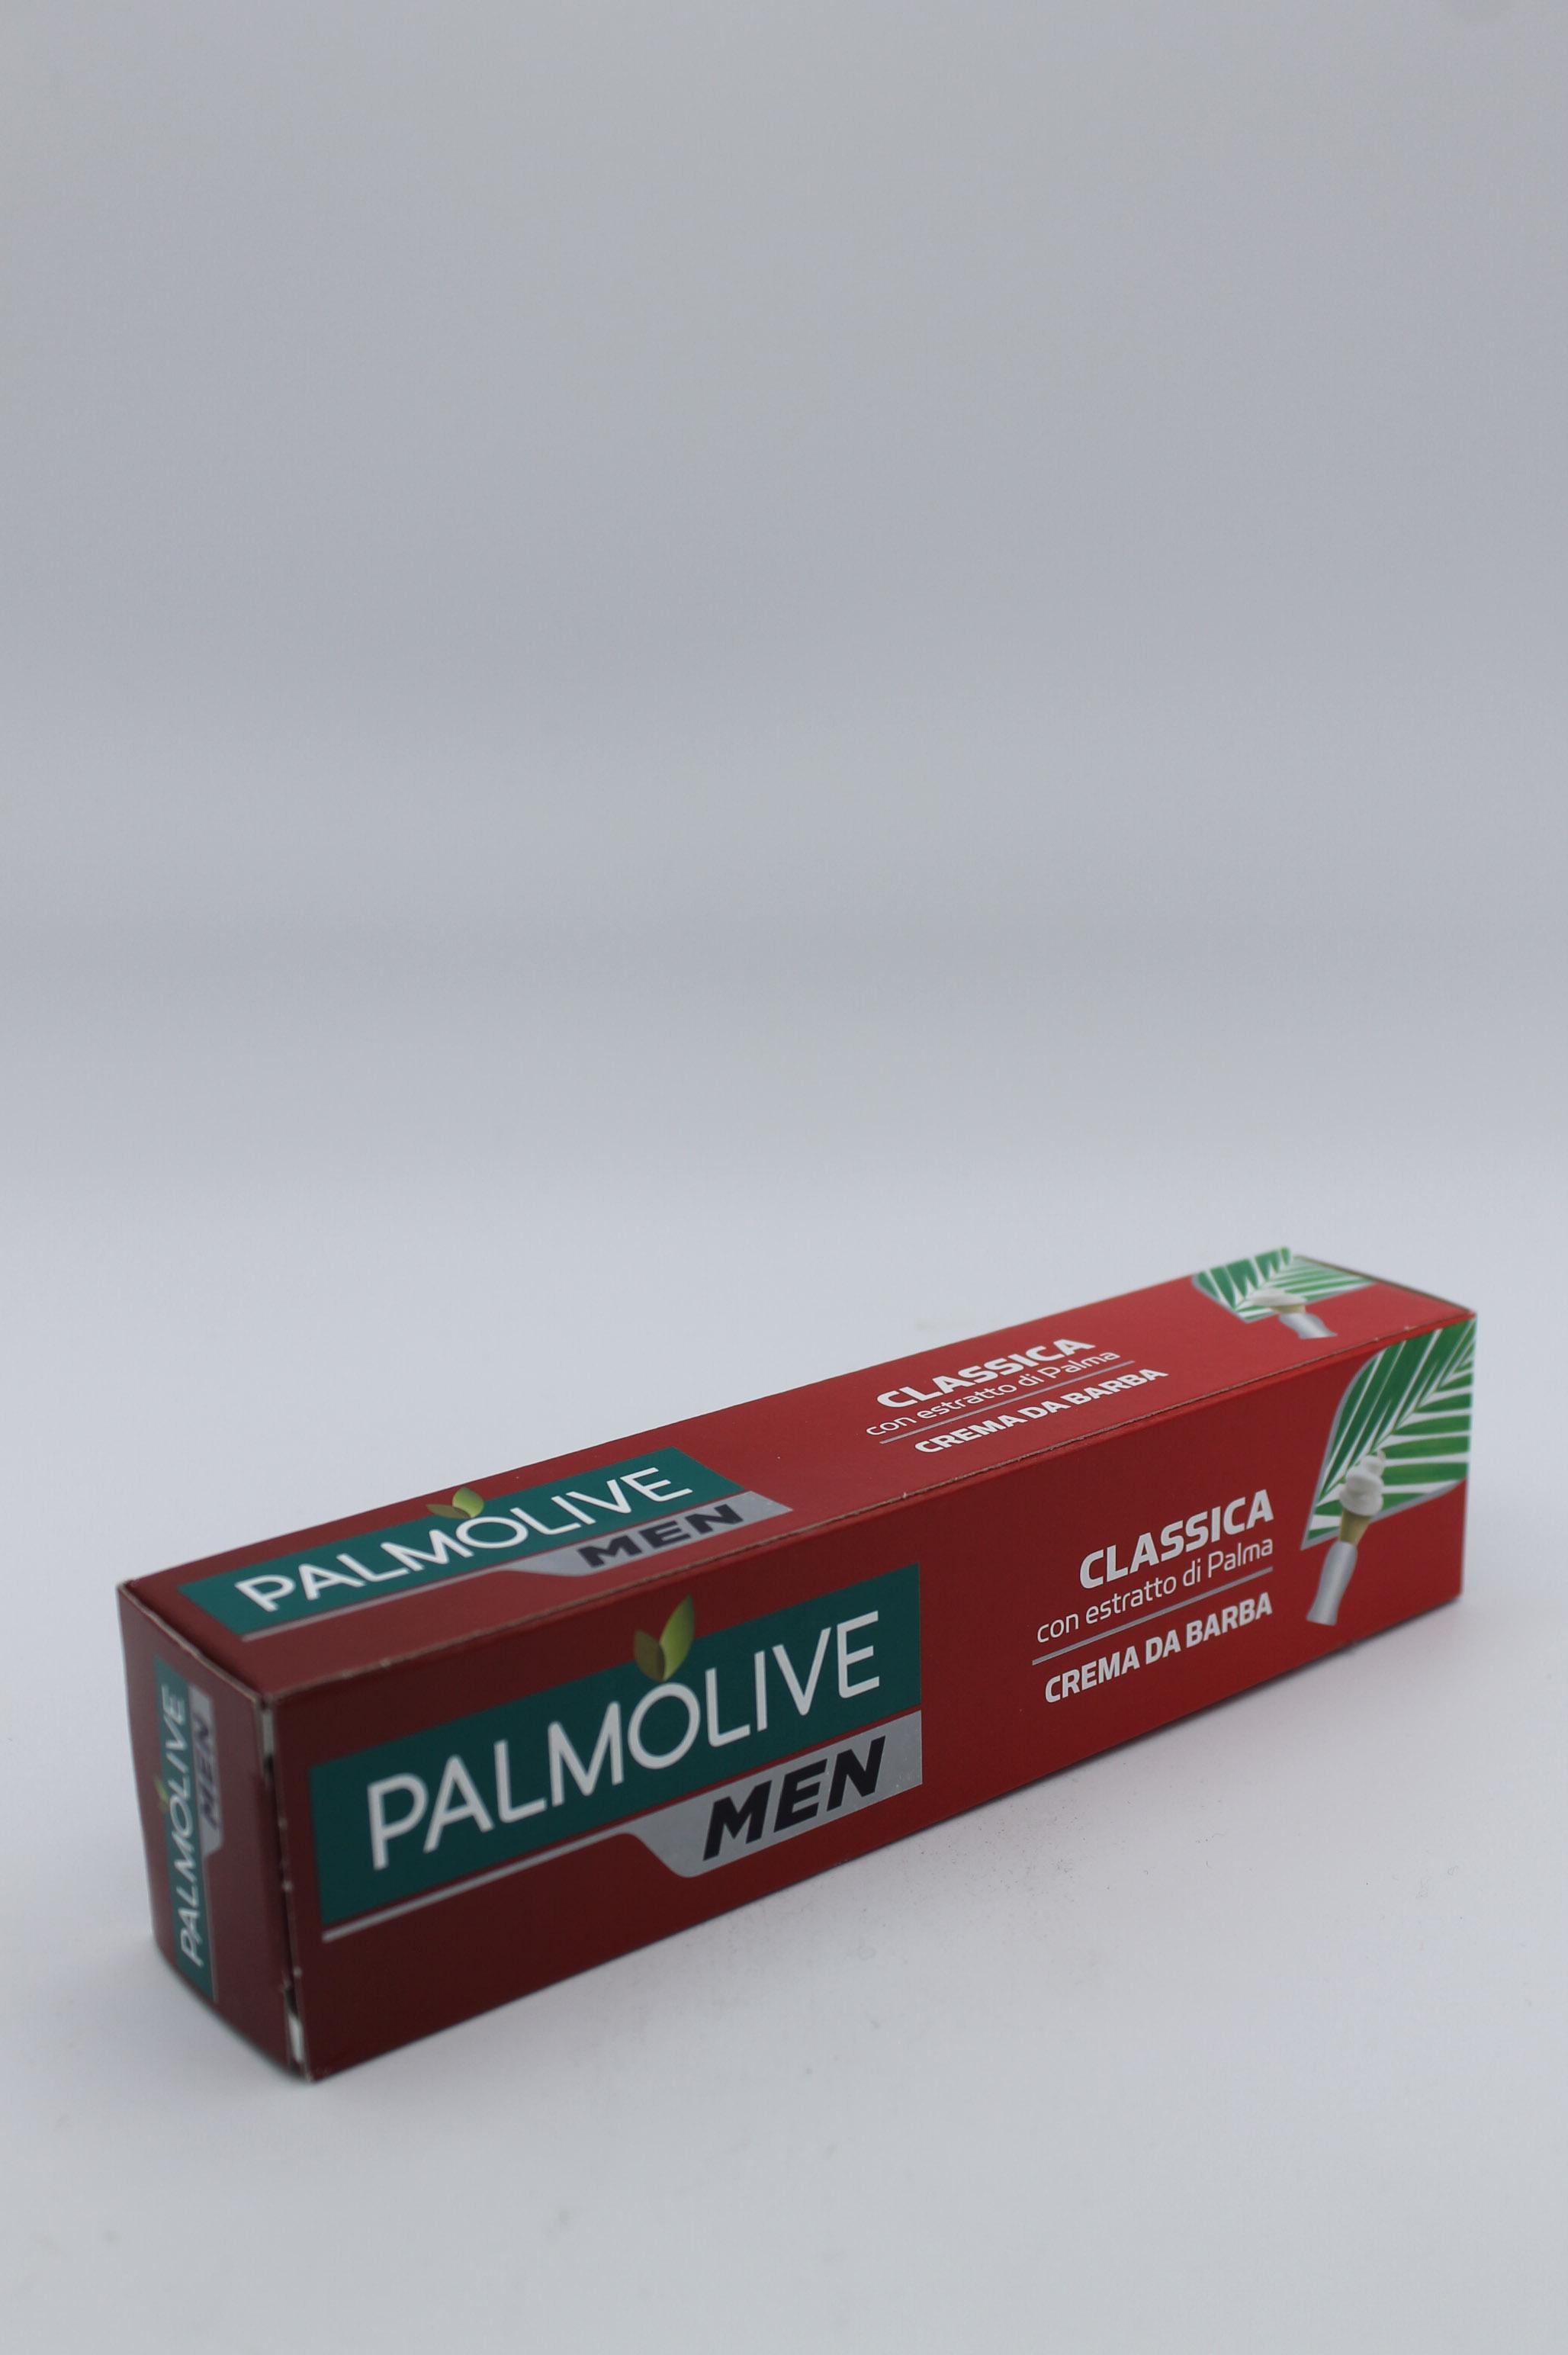 Palmolive crema barba tubo 100ml.